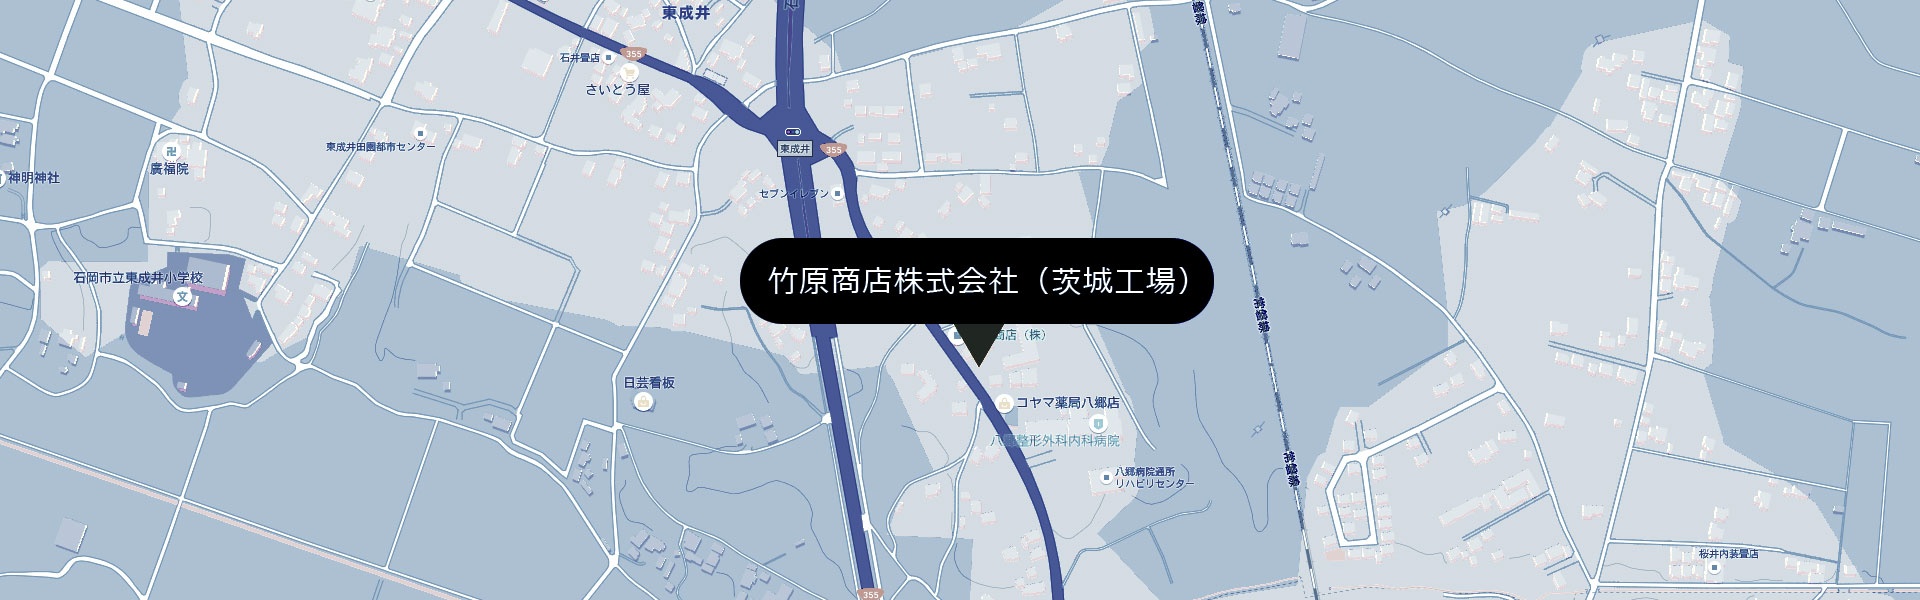 access-map-ibaraki